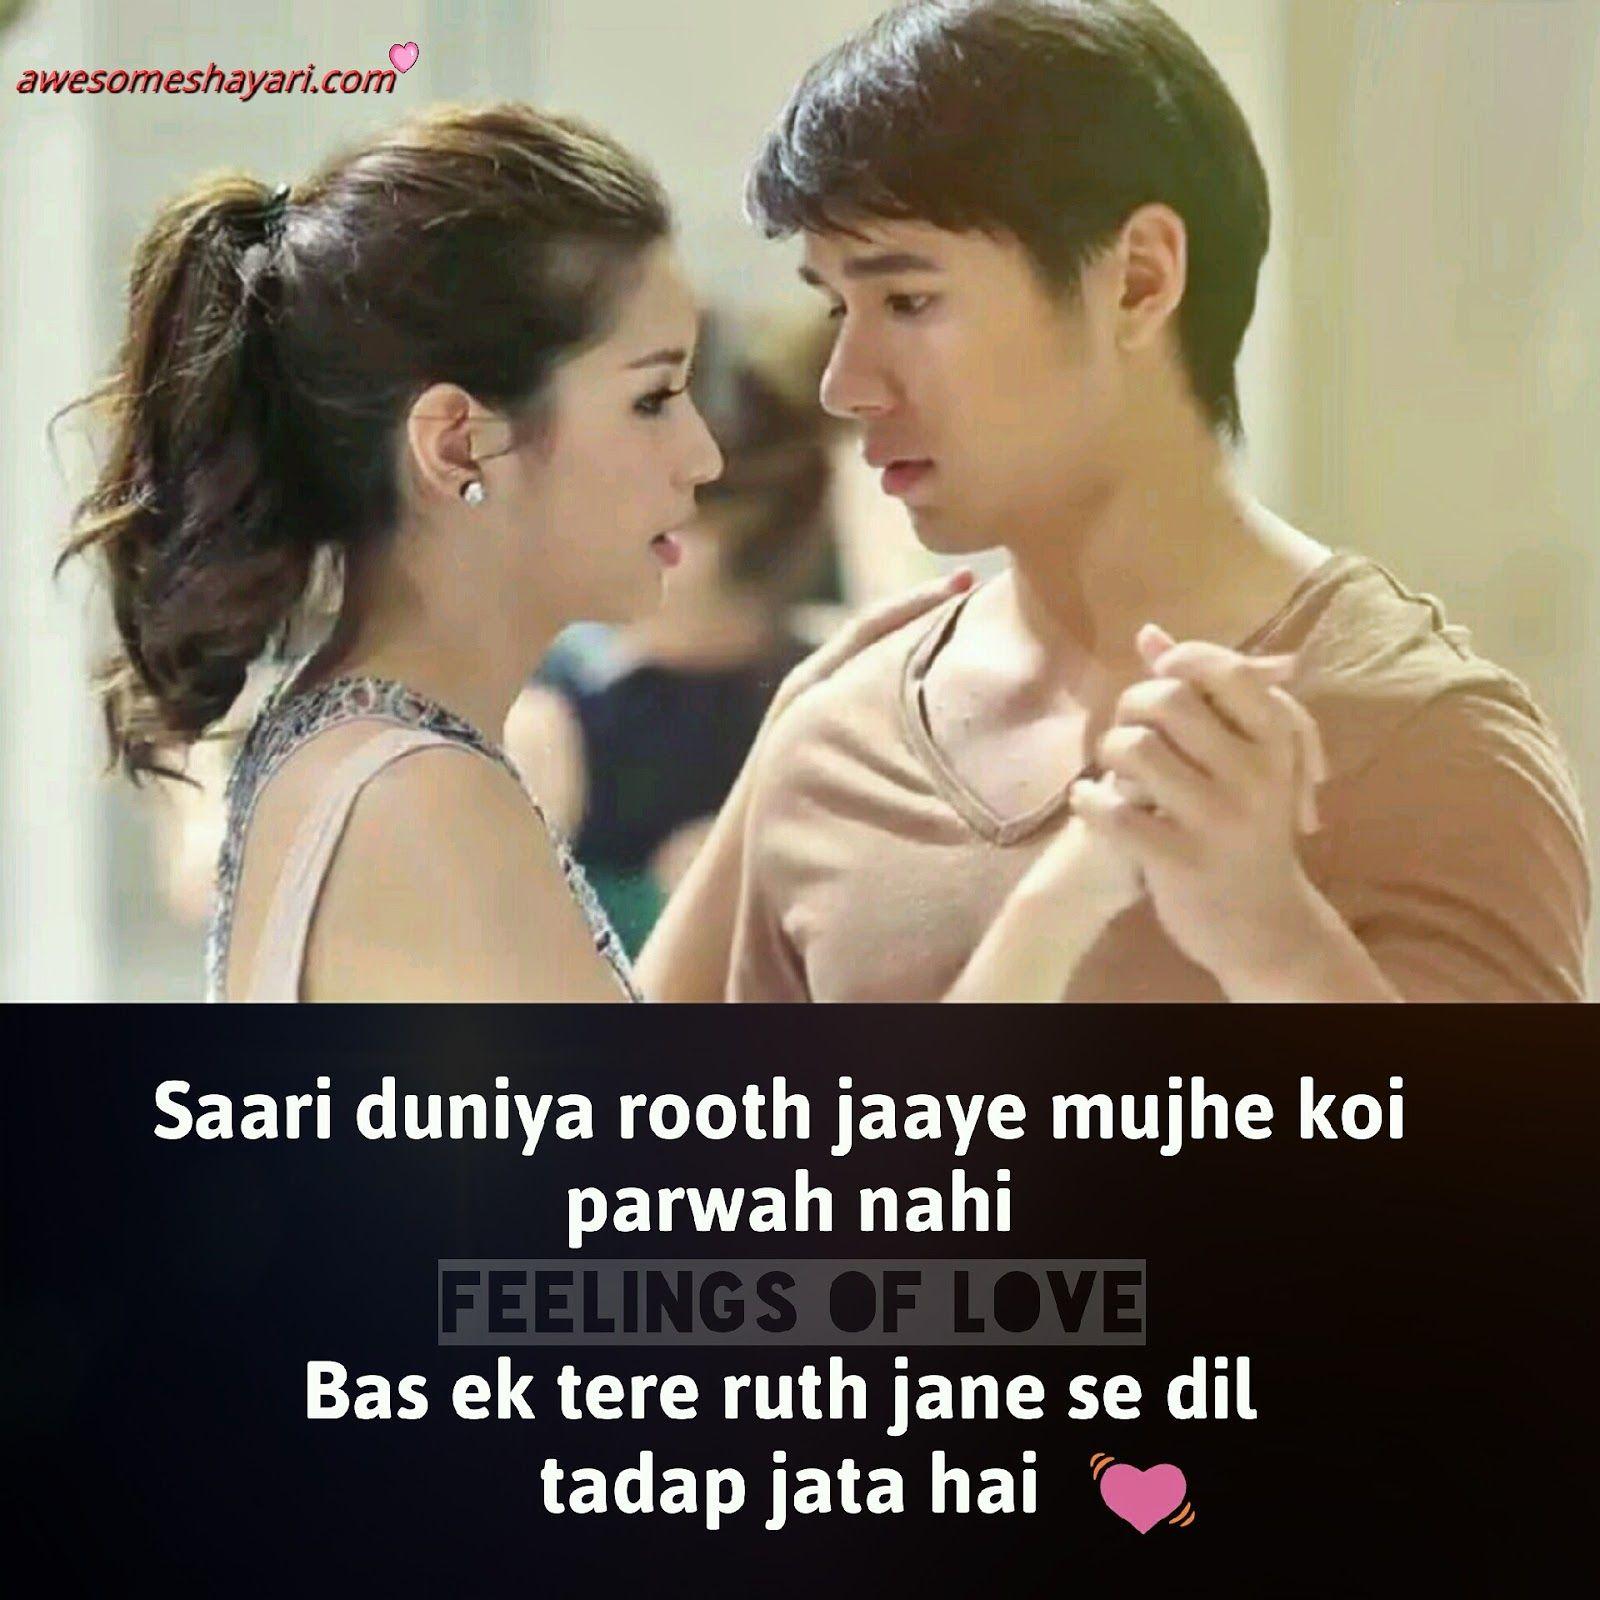 Saari duniya rooth jaaye mujhse koi parwah nahi bas ek for Koi 5 vigyapan in hindi